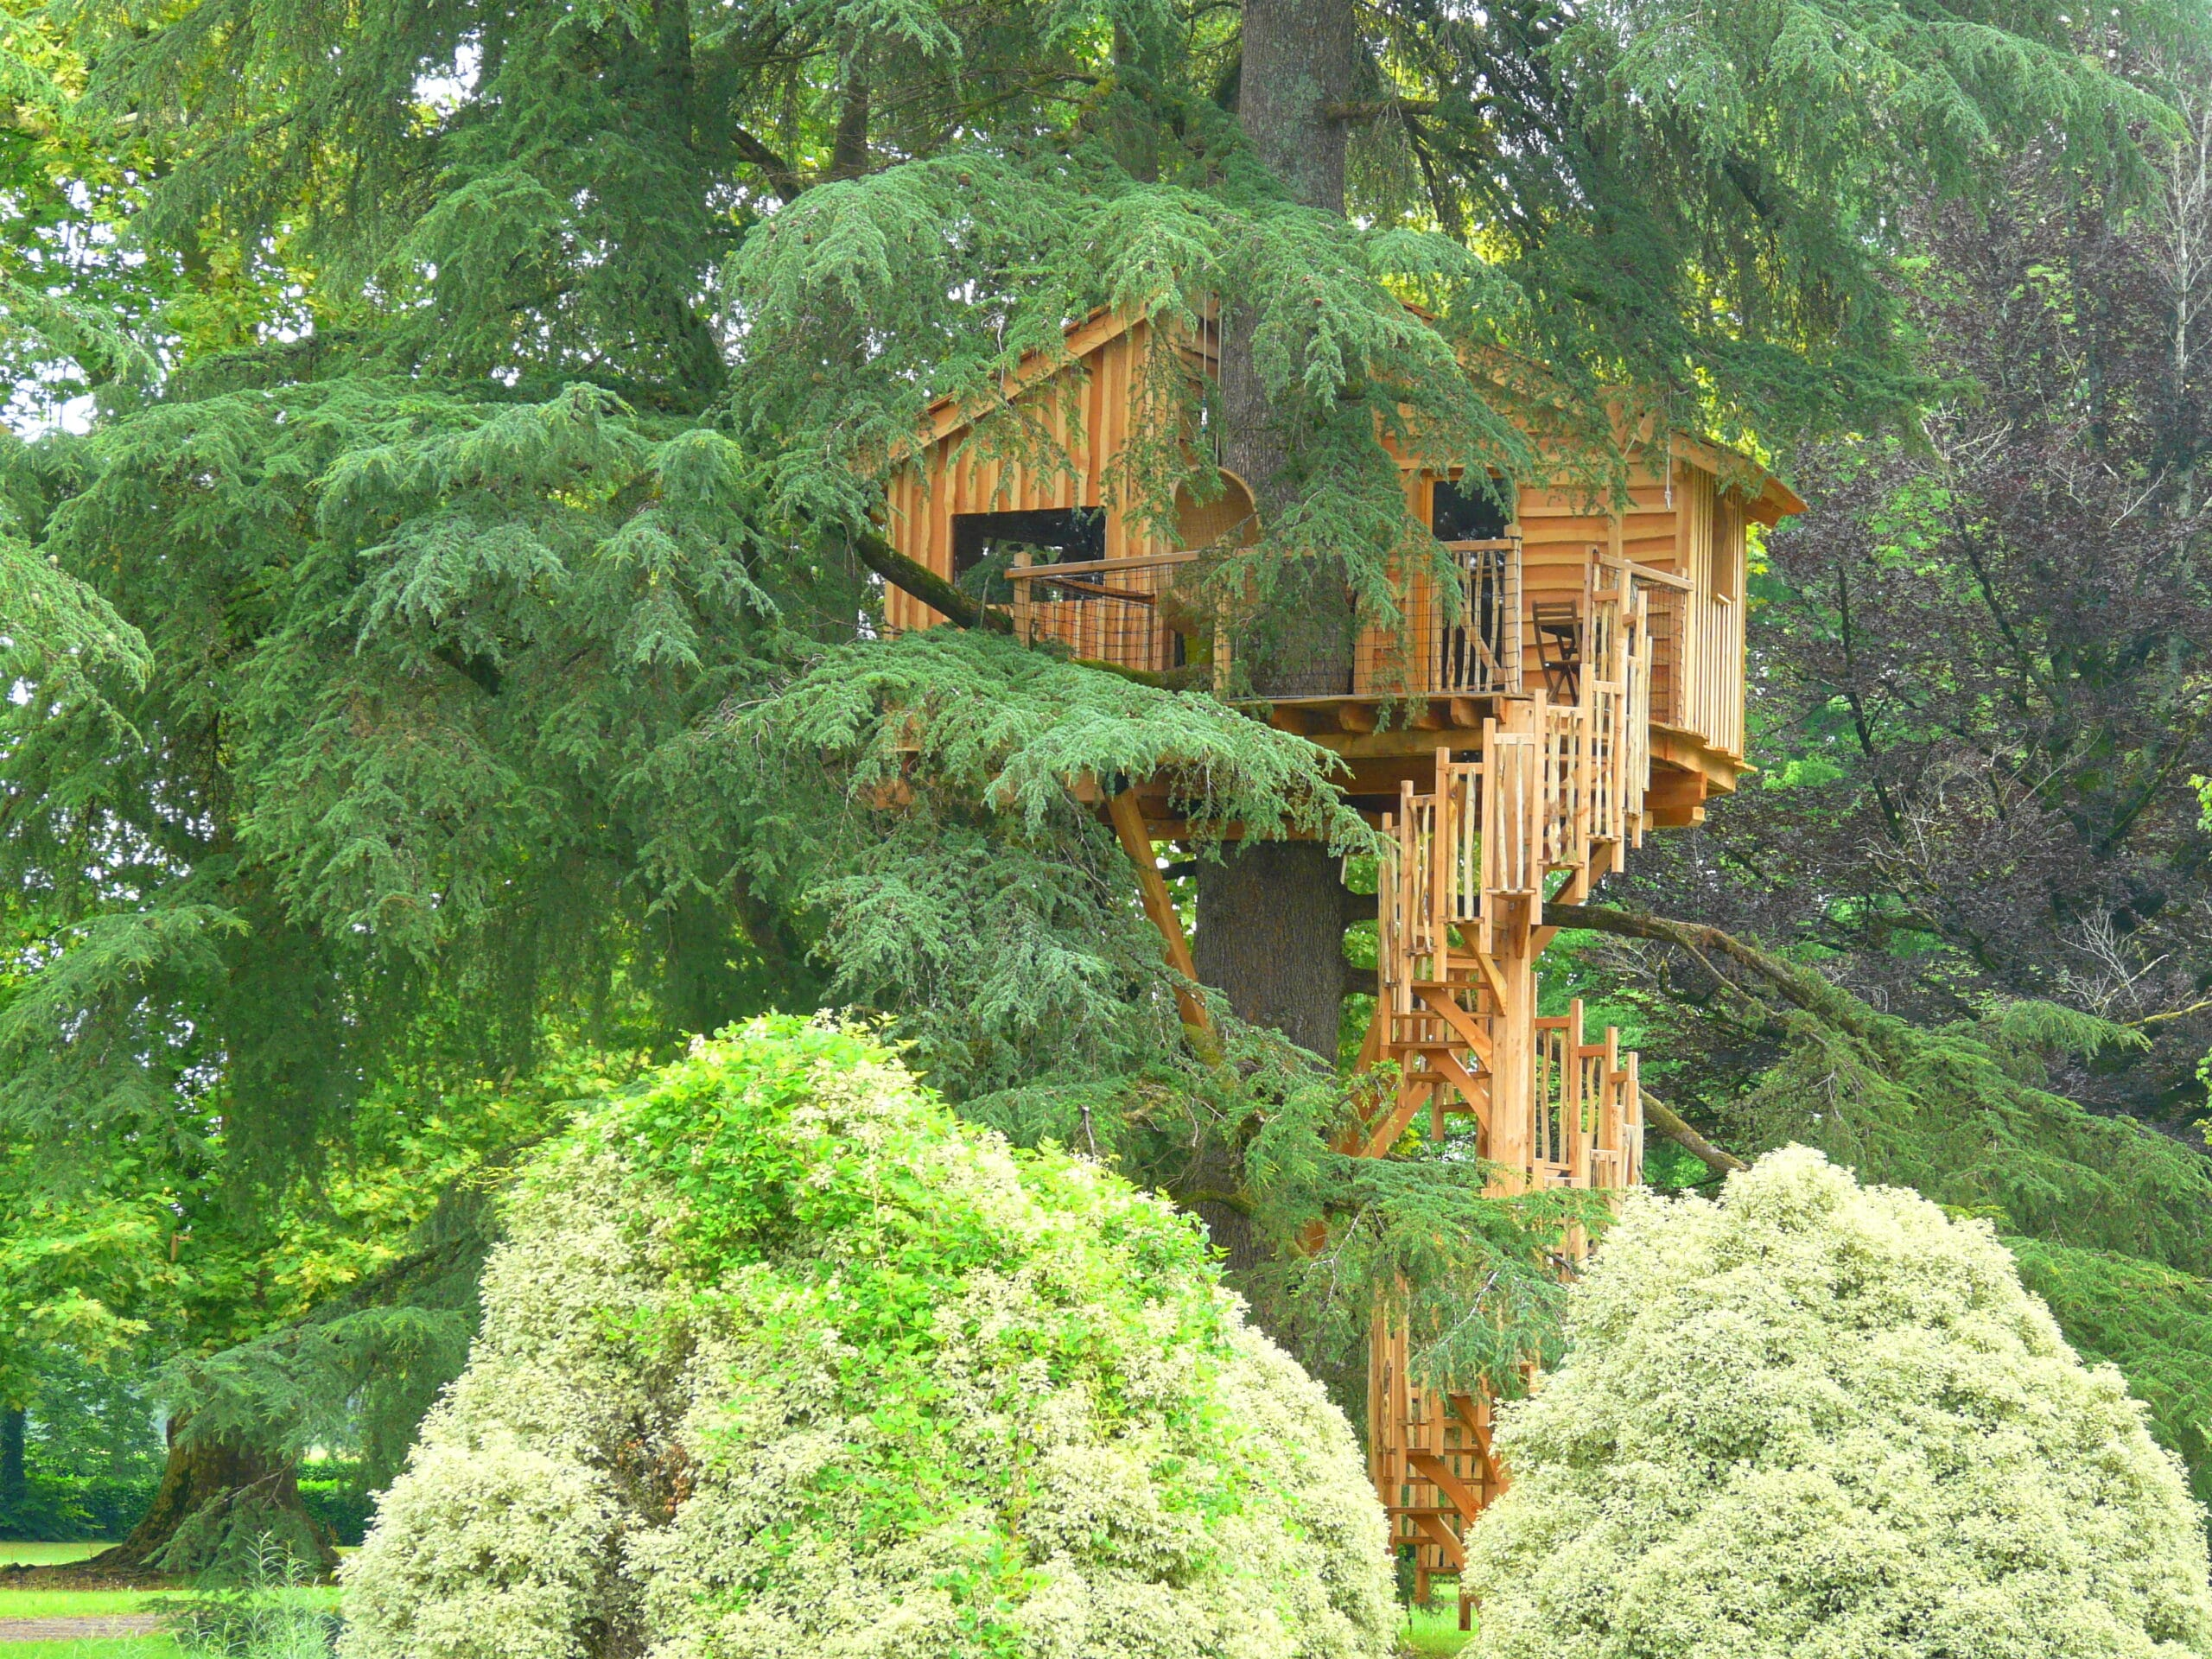 cabane dans les arbres béarn